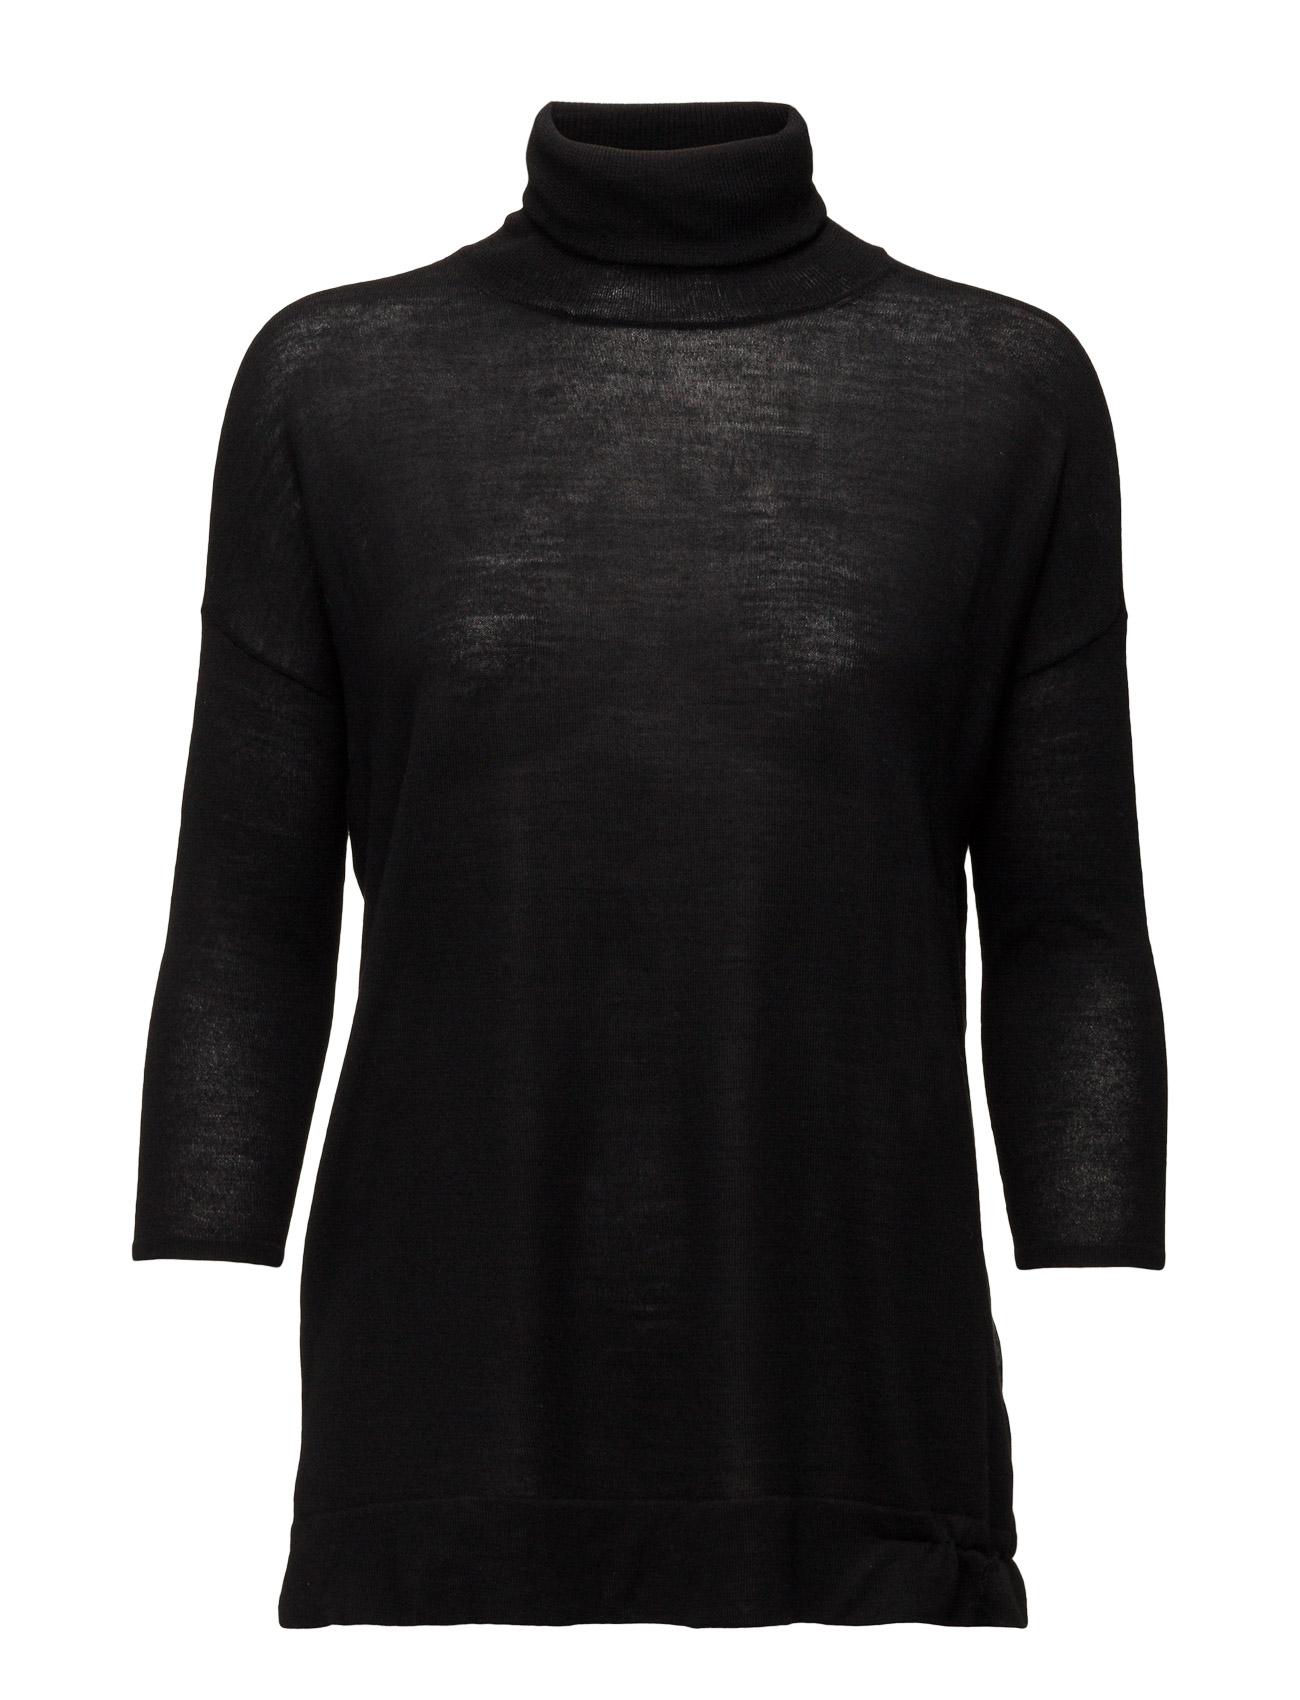 camilla tn sweater 34 calvin klein jeans in de aanbieding kopen. Black Bedroom Furniture Sets. Home Design Ideas